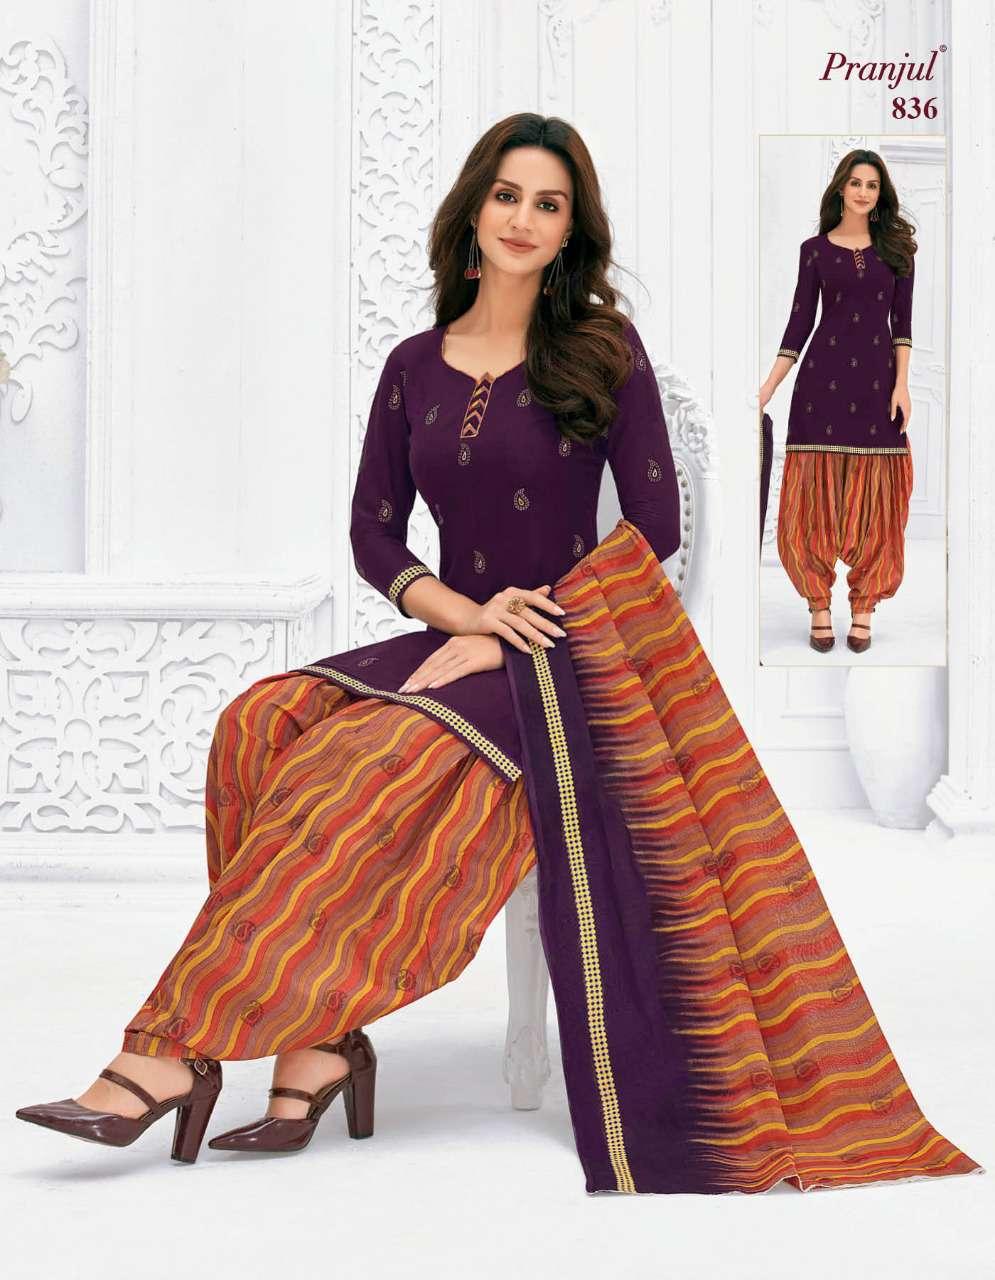 Pranjul 3XL Priyanka Vol 8 B Readymade Suit Wholesale Catalog 15 Pcs 15 - Pranjul 3XL Priyanka Vol 8 B Readymade Suit Wholesale Catalog 15 Pcs